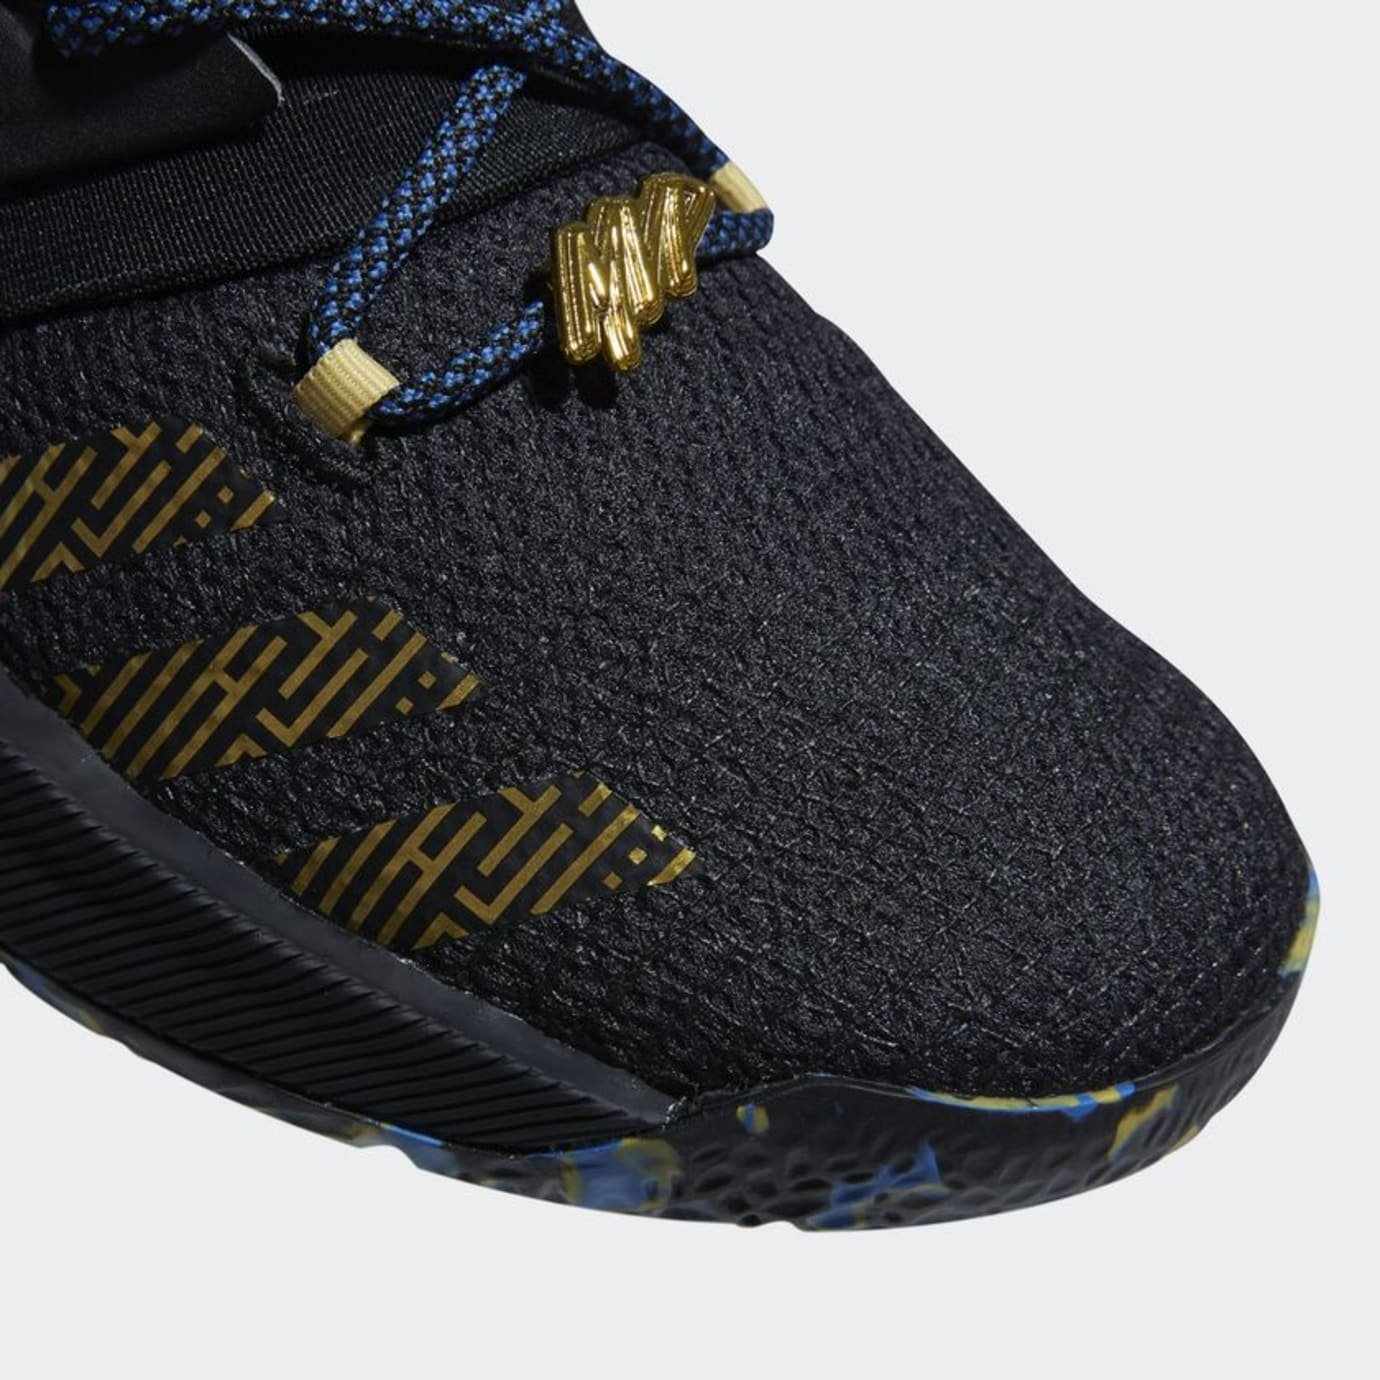 adidas-harden-vol-2-mvp-toe